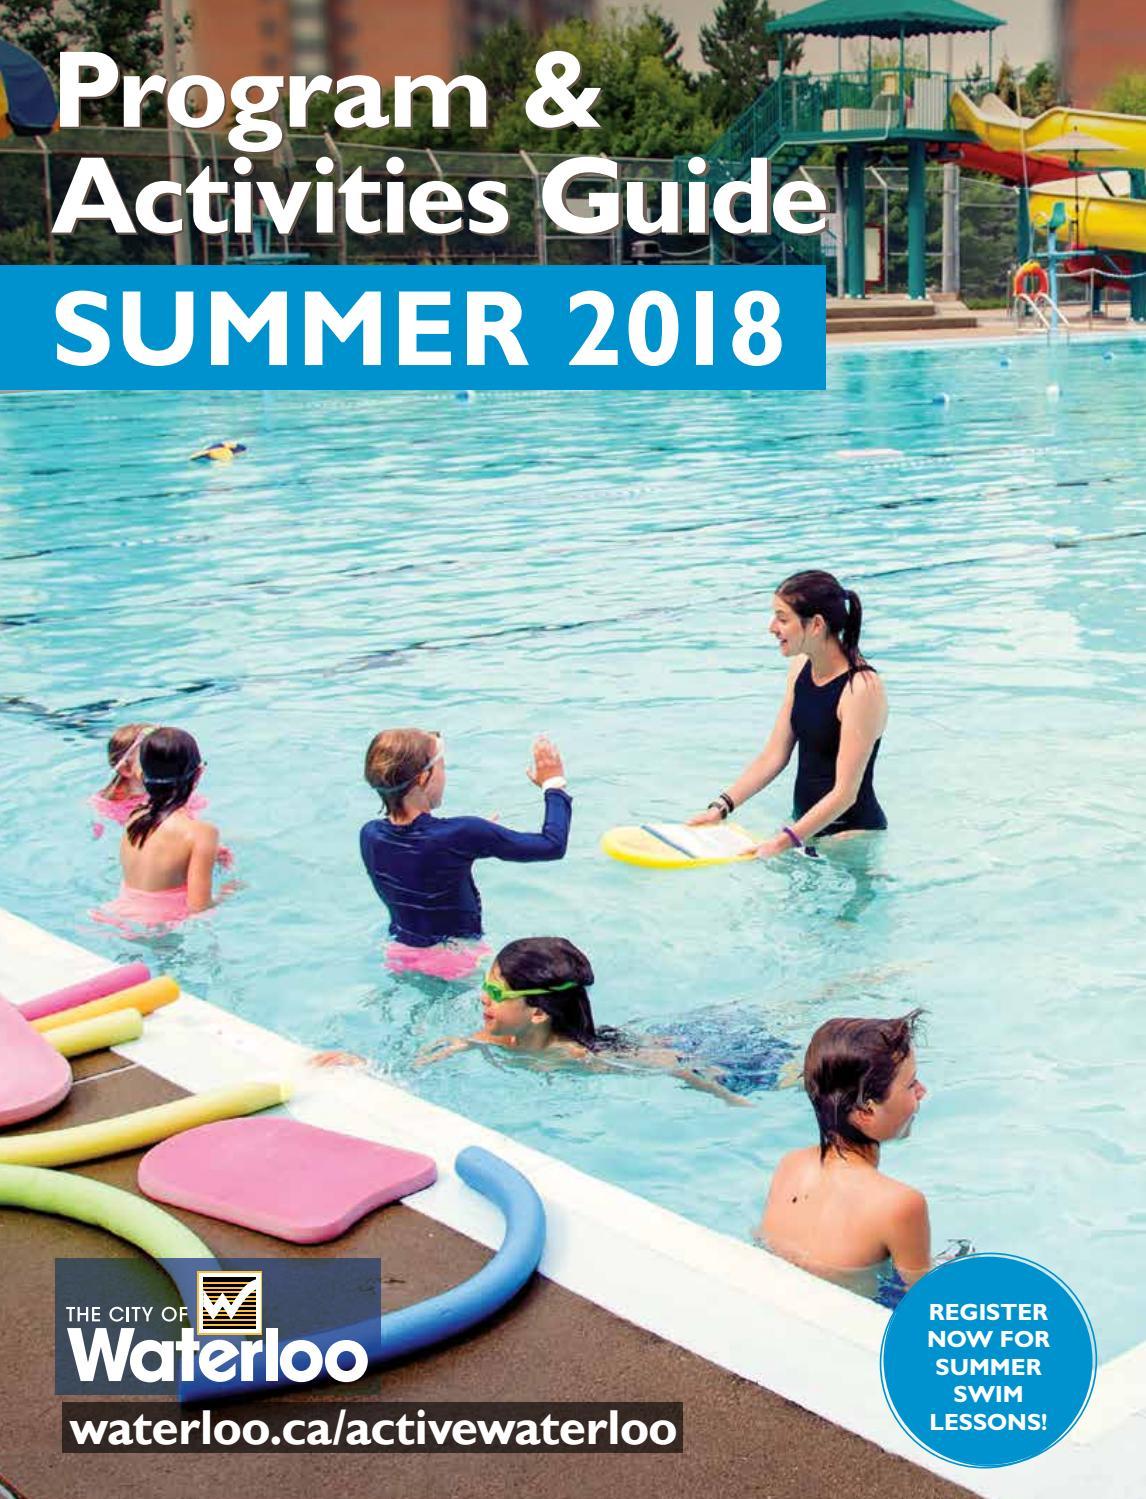 Summer 2018 Program & Activities Guide by City of Waterloo - issuu